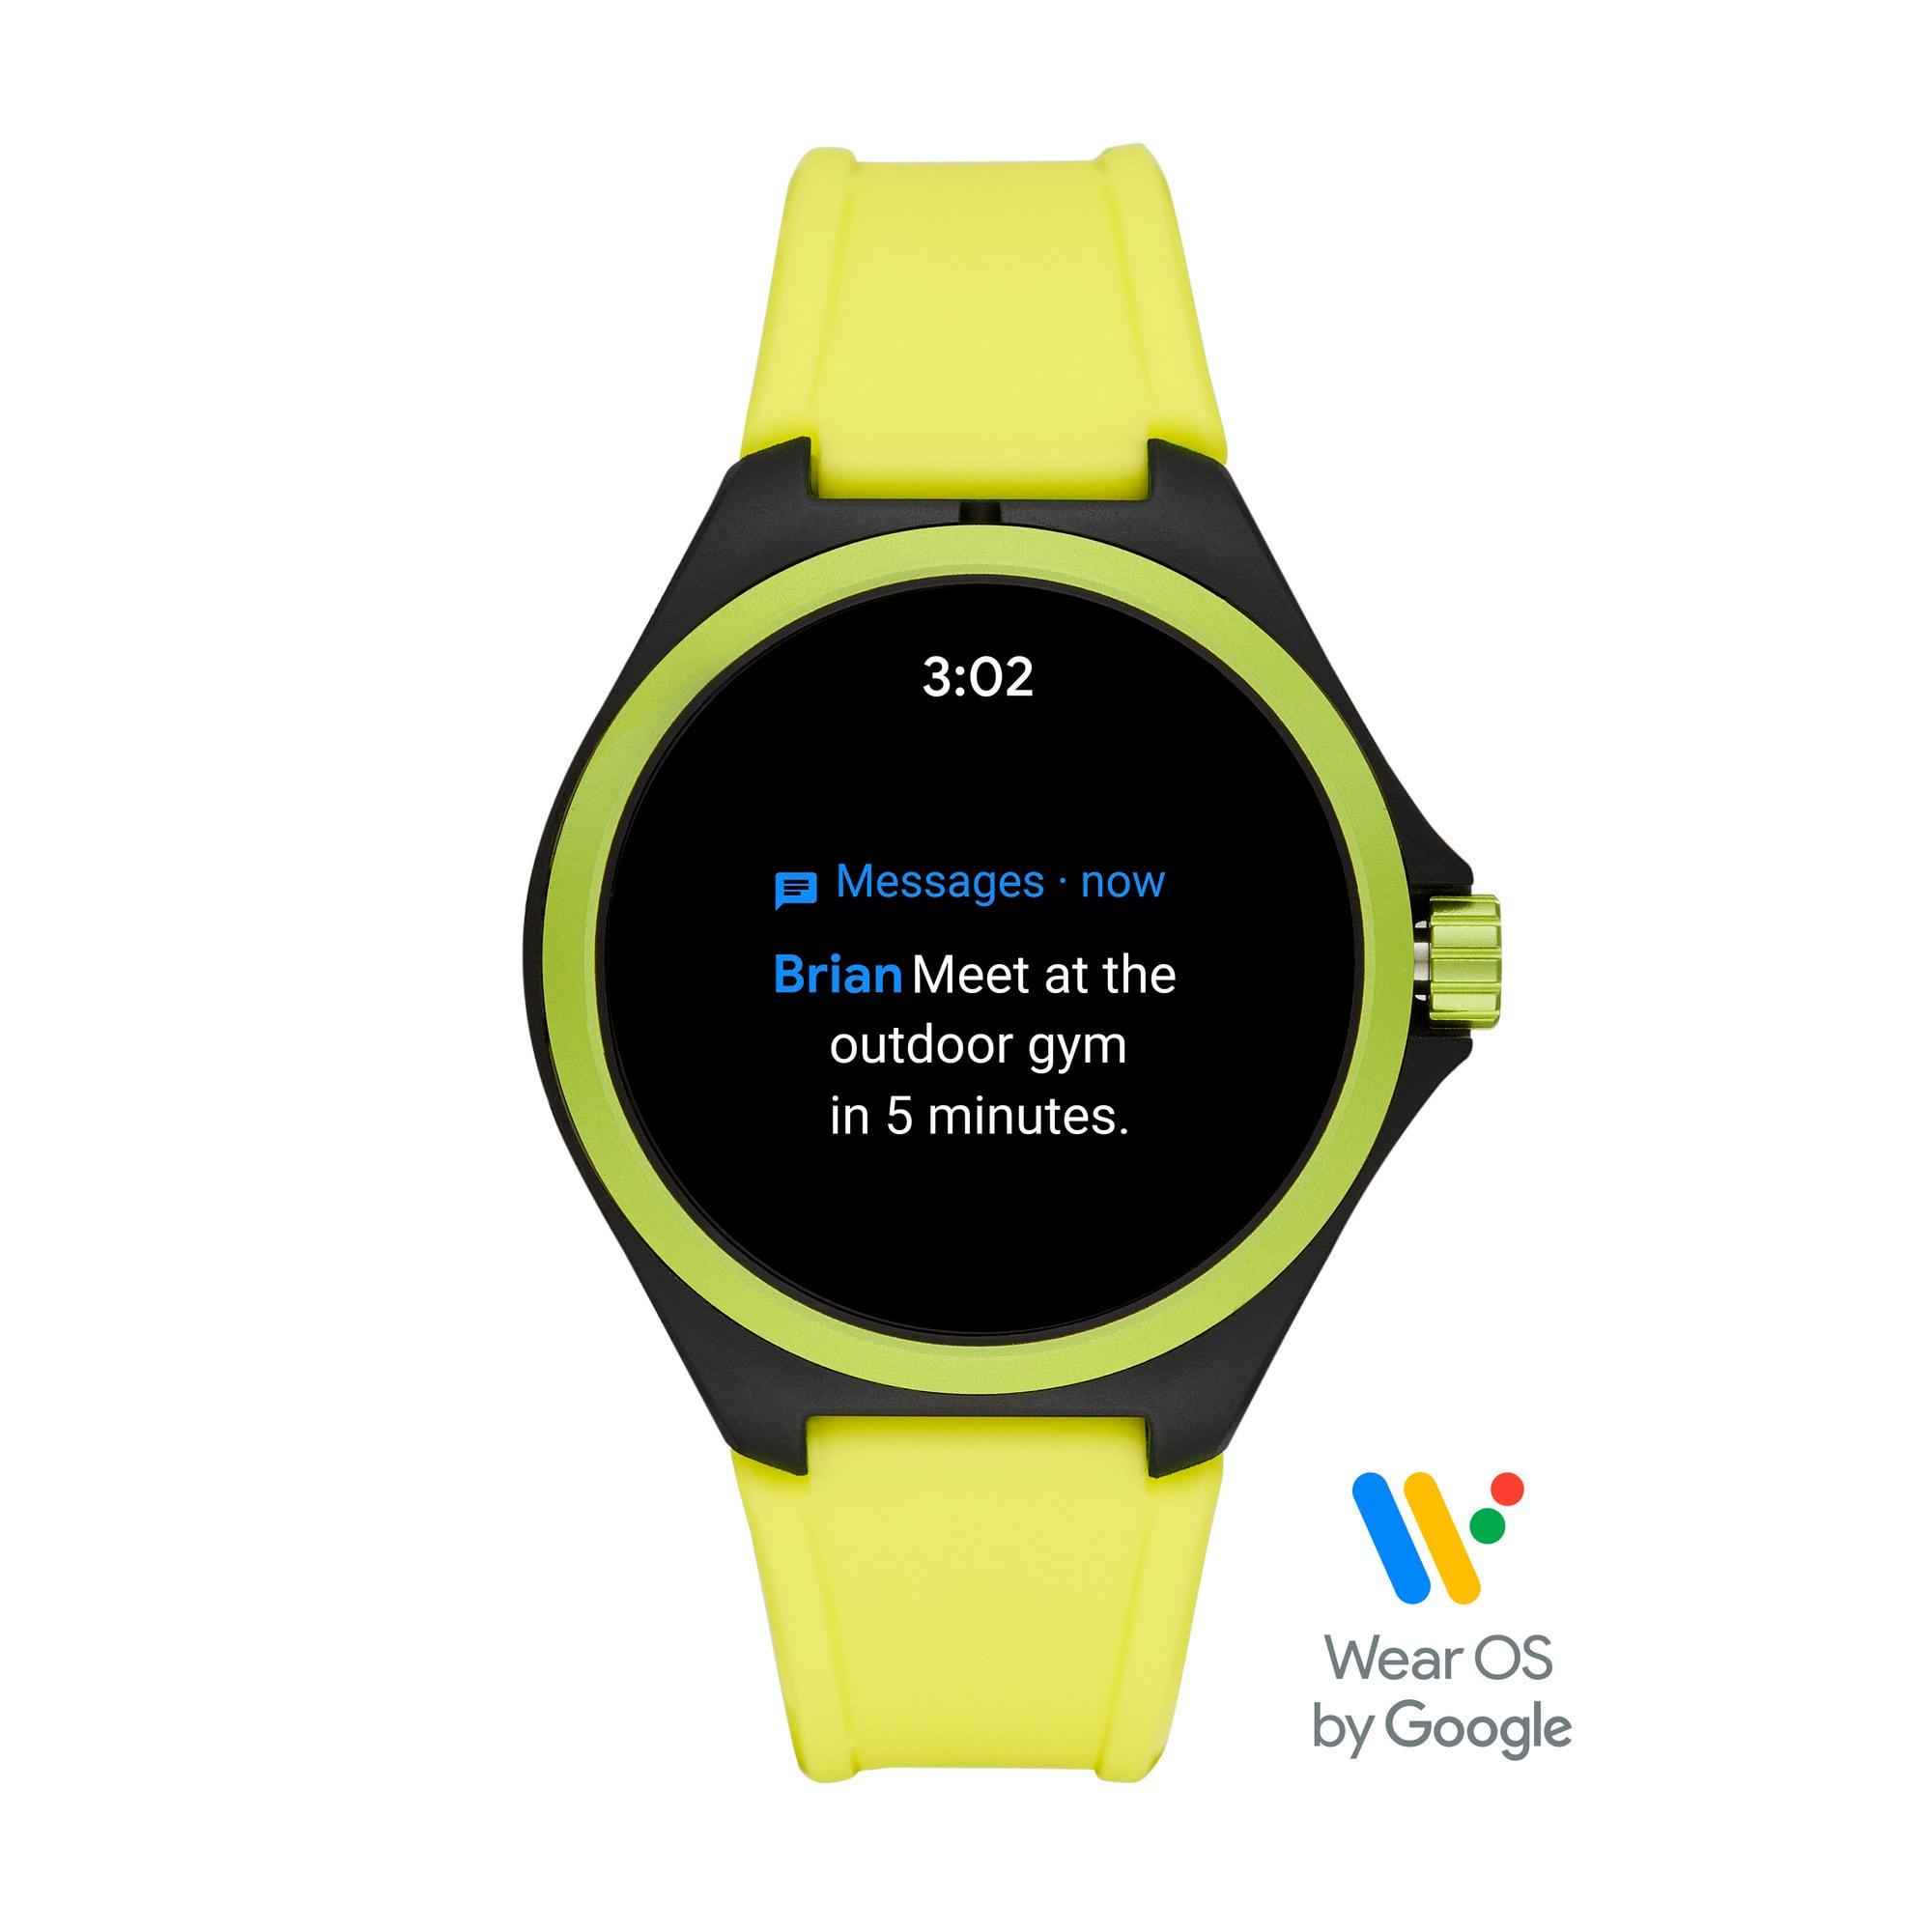 Thumbnail 7 of PUMA Smartwatch, Yellow/Black, medium